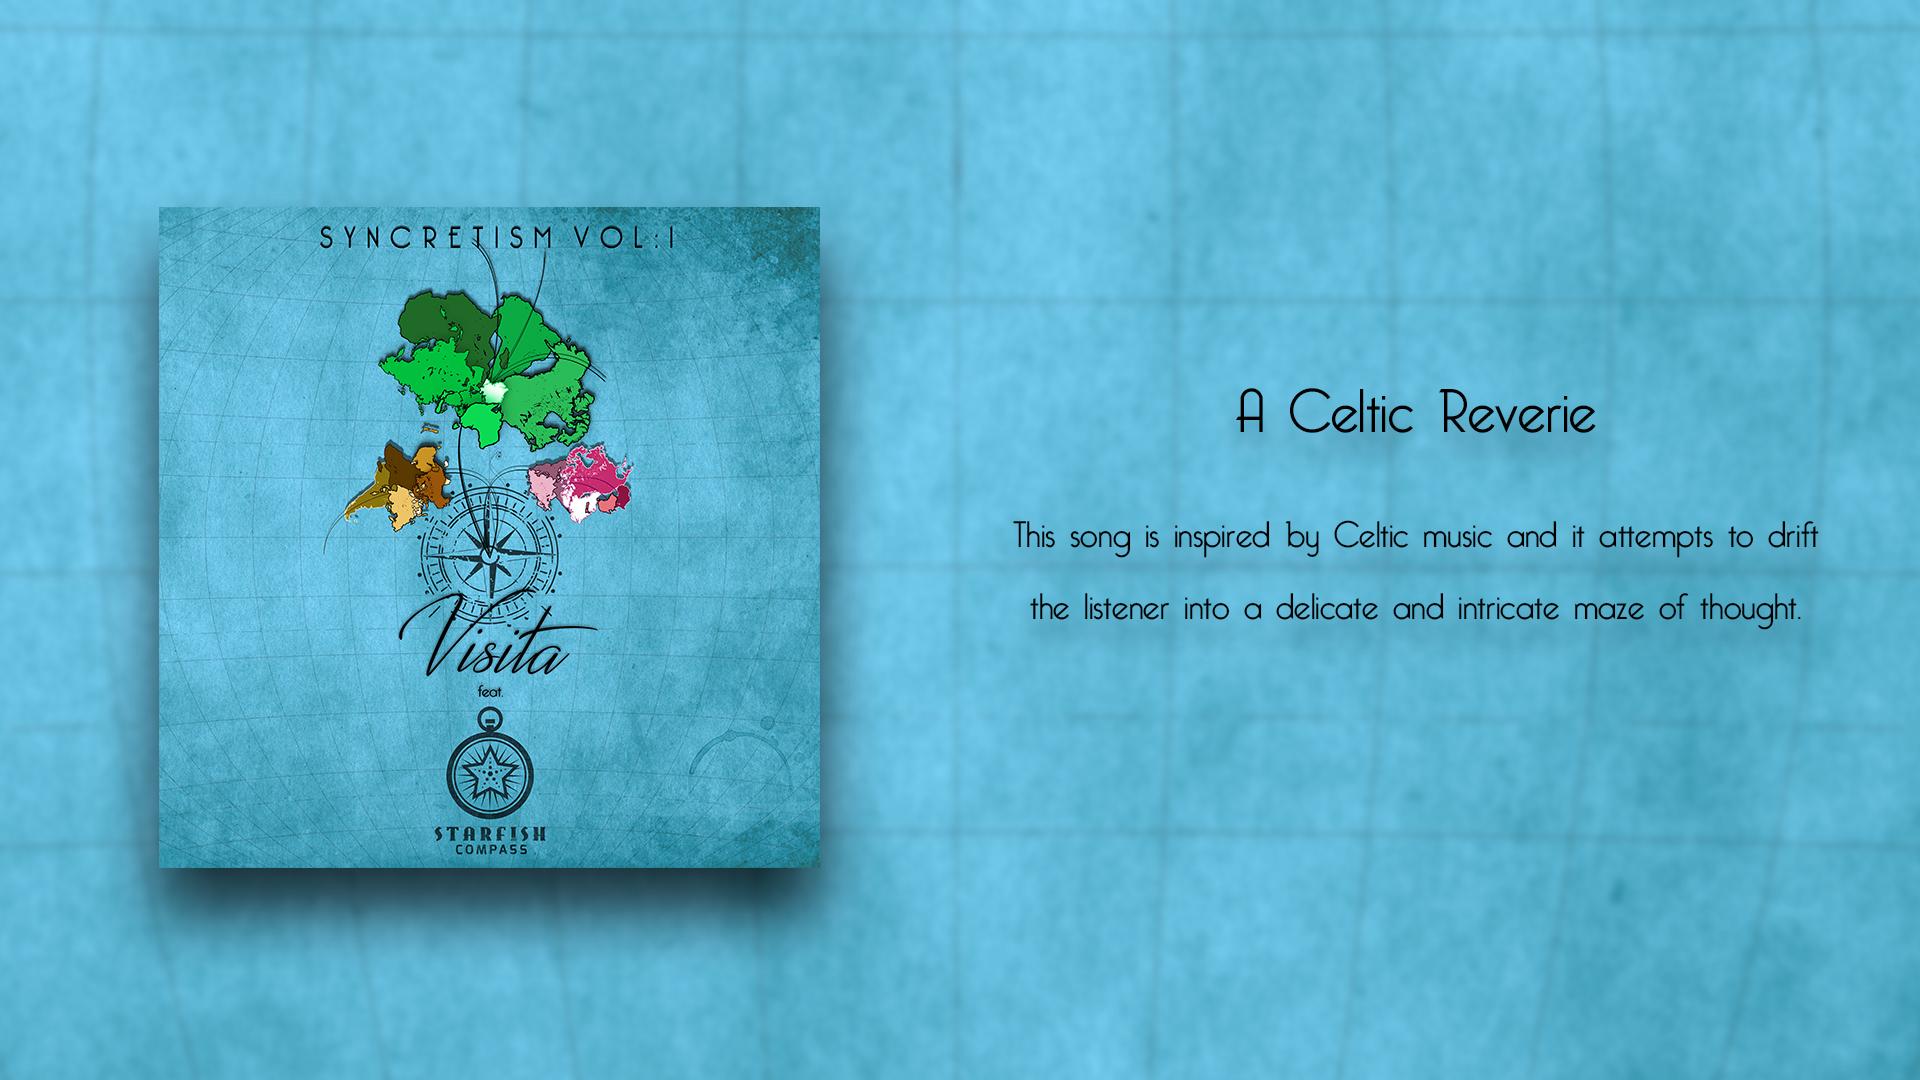 a-celtic-reverie-